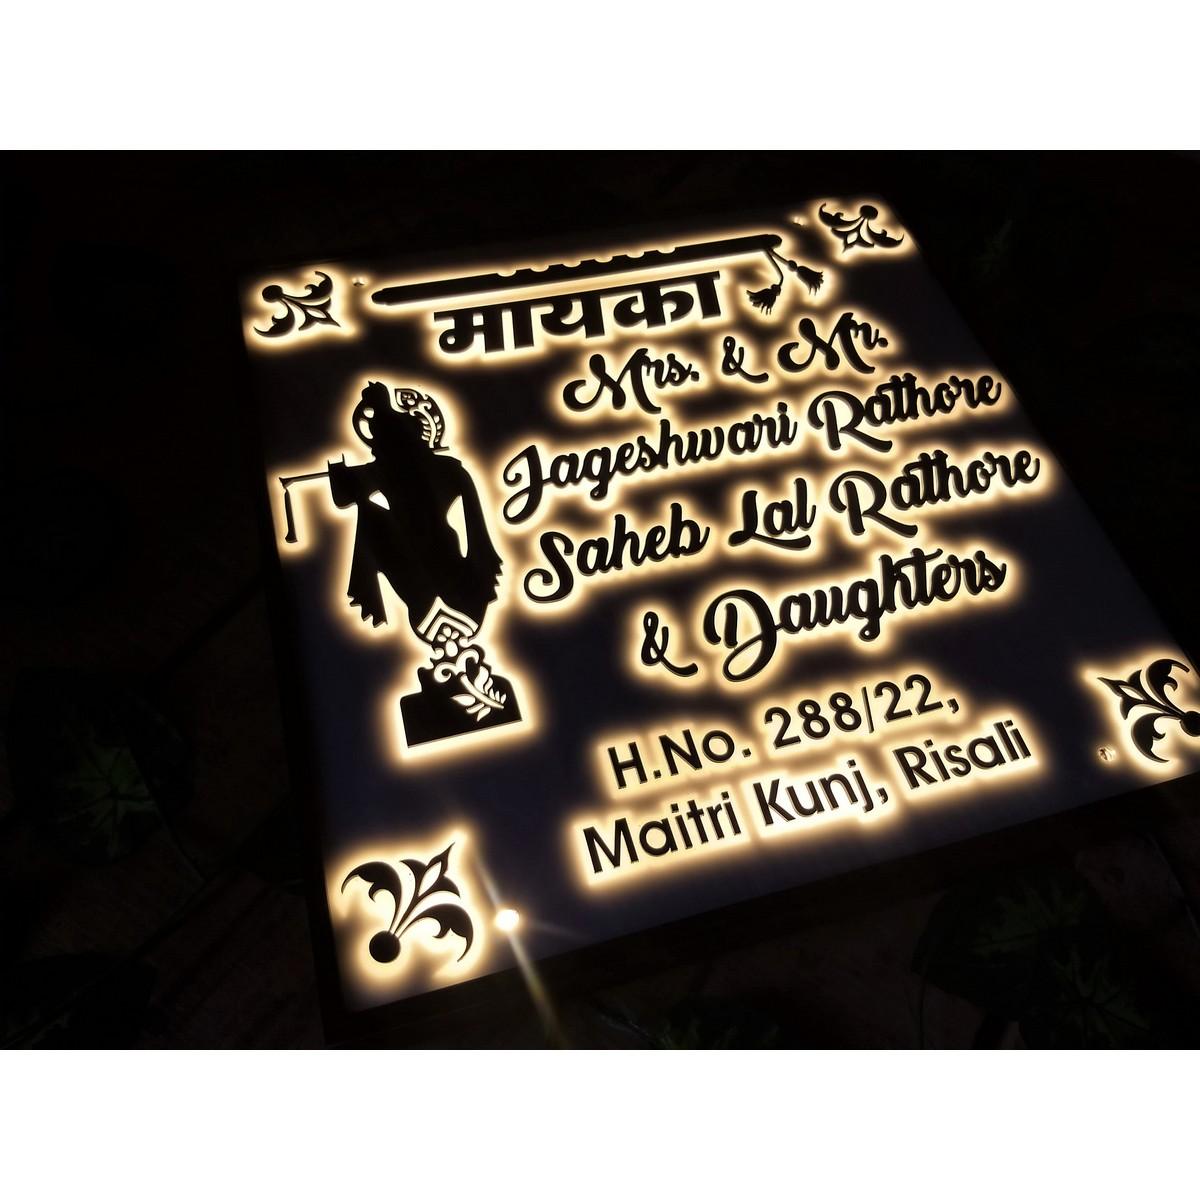 Krishan Ji Light Name Plate  Weatherproof  Krishan Ji Light Name Plate  Weatherproof 3